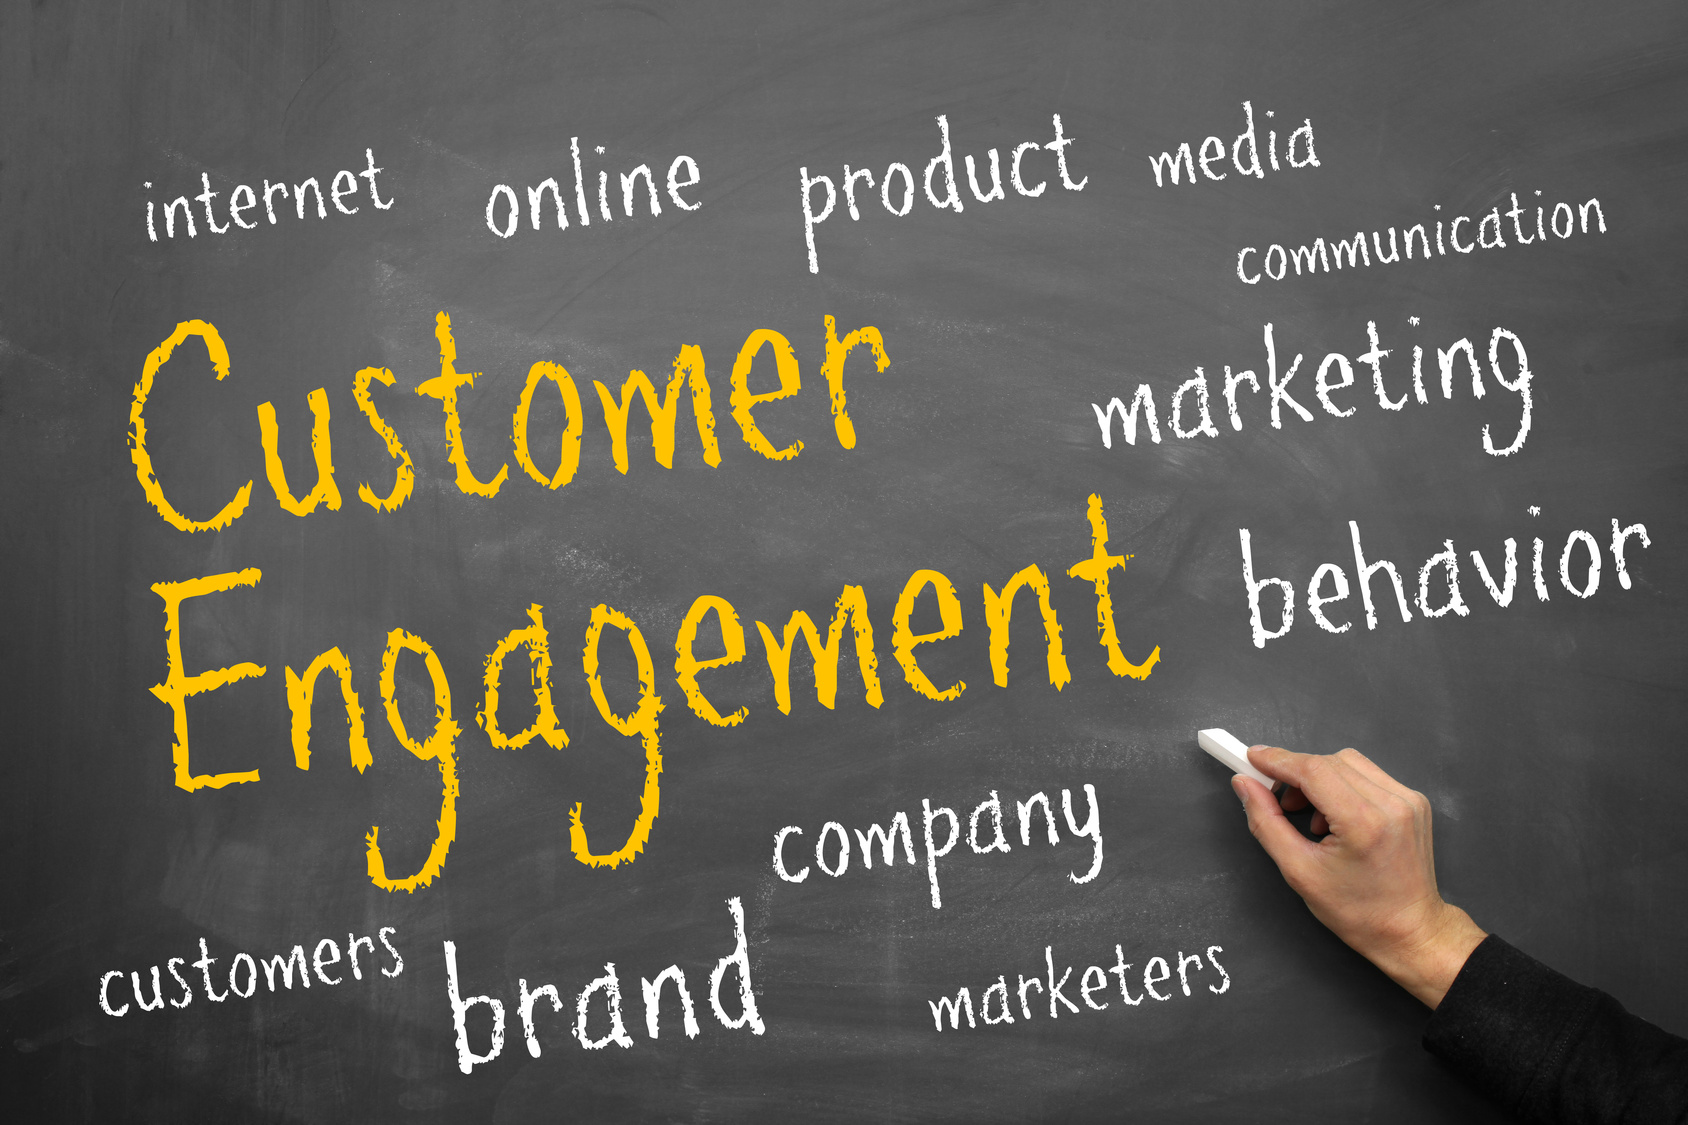 Creating Value through Customer Relationship Management (CRM)